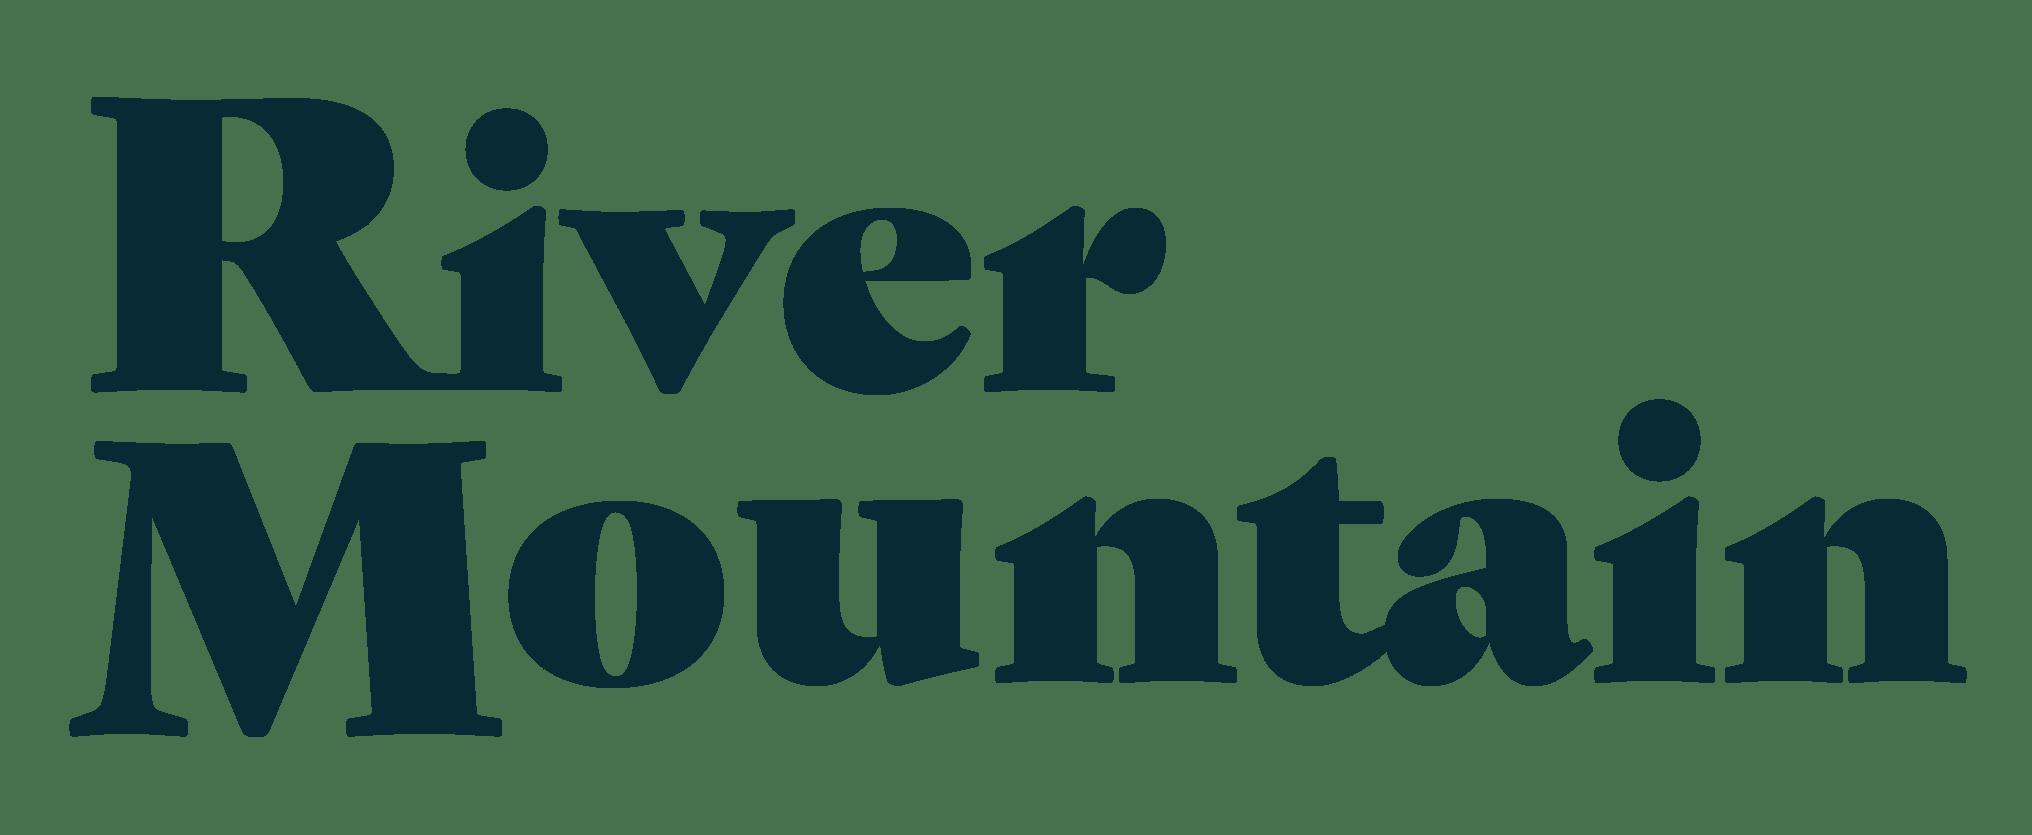 River Mountain Retreat - Logo Midnight